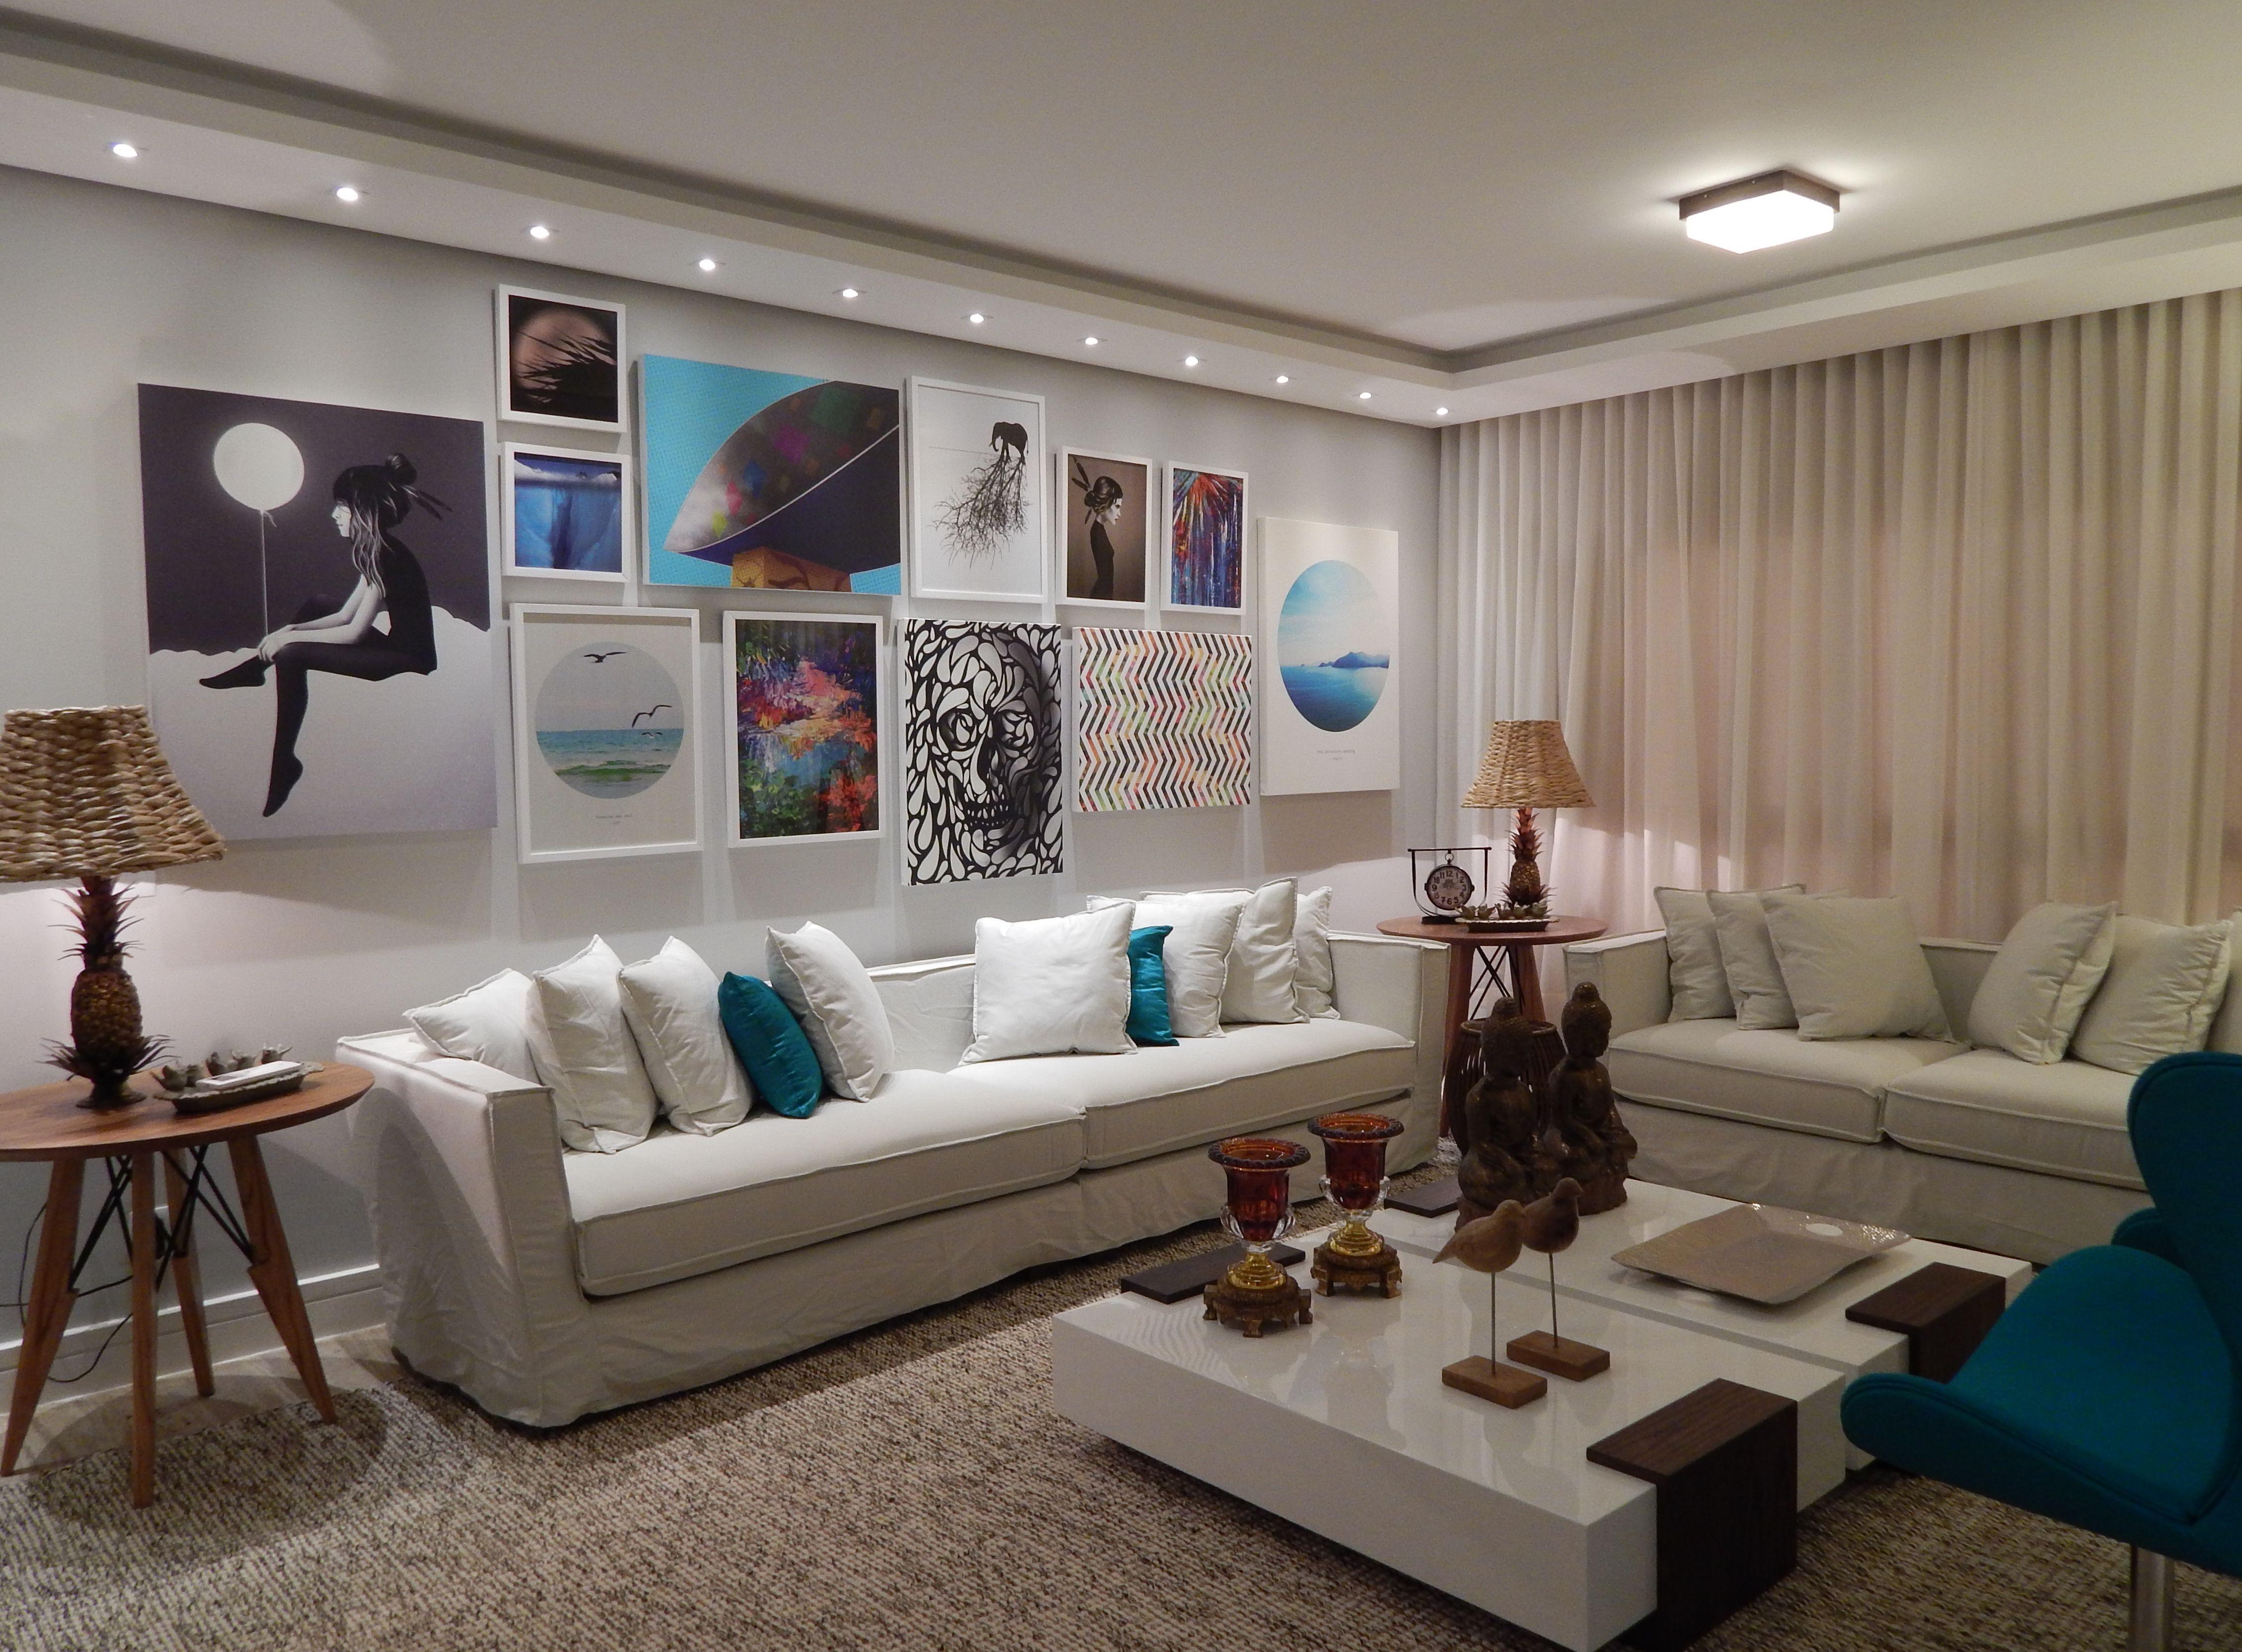 Sala De Estar 2014 Arquiteta Barbara Panassi Azul Turquesa  -> Sala Parede Gelo